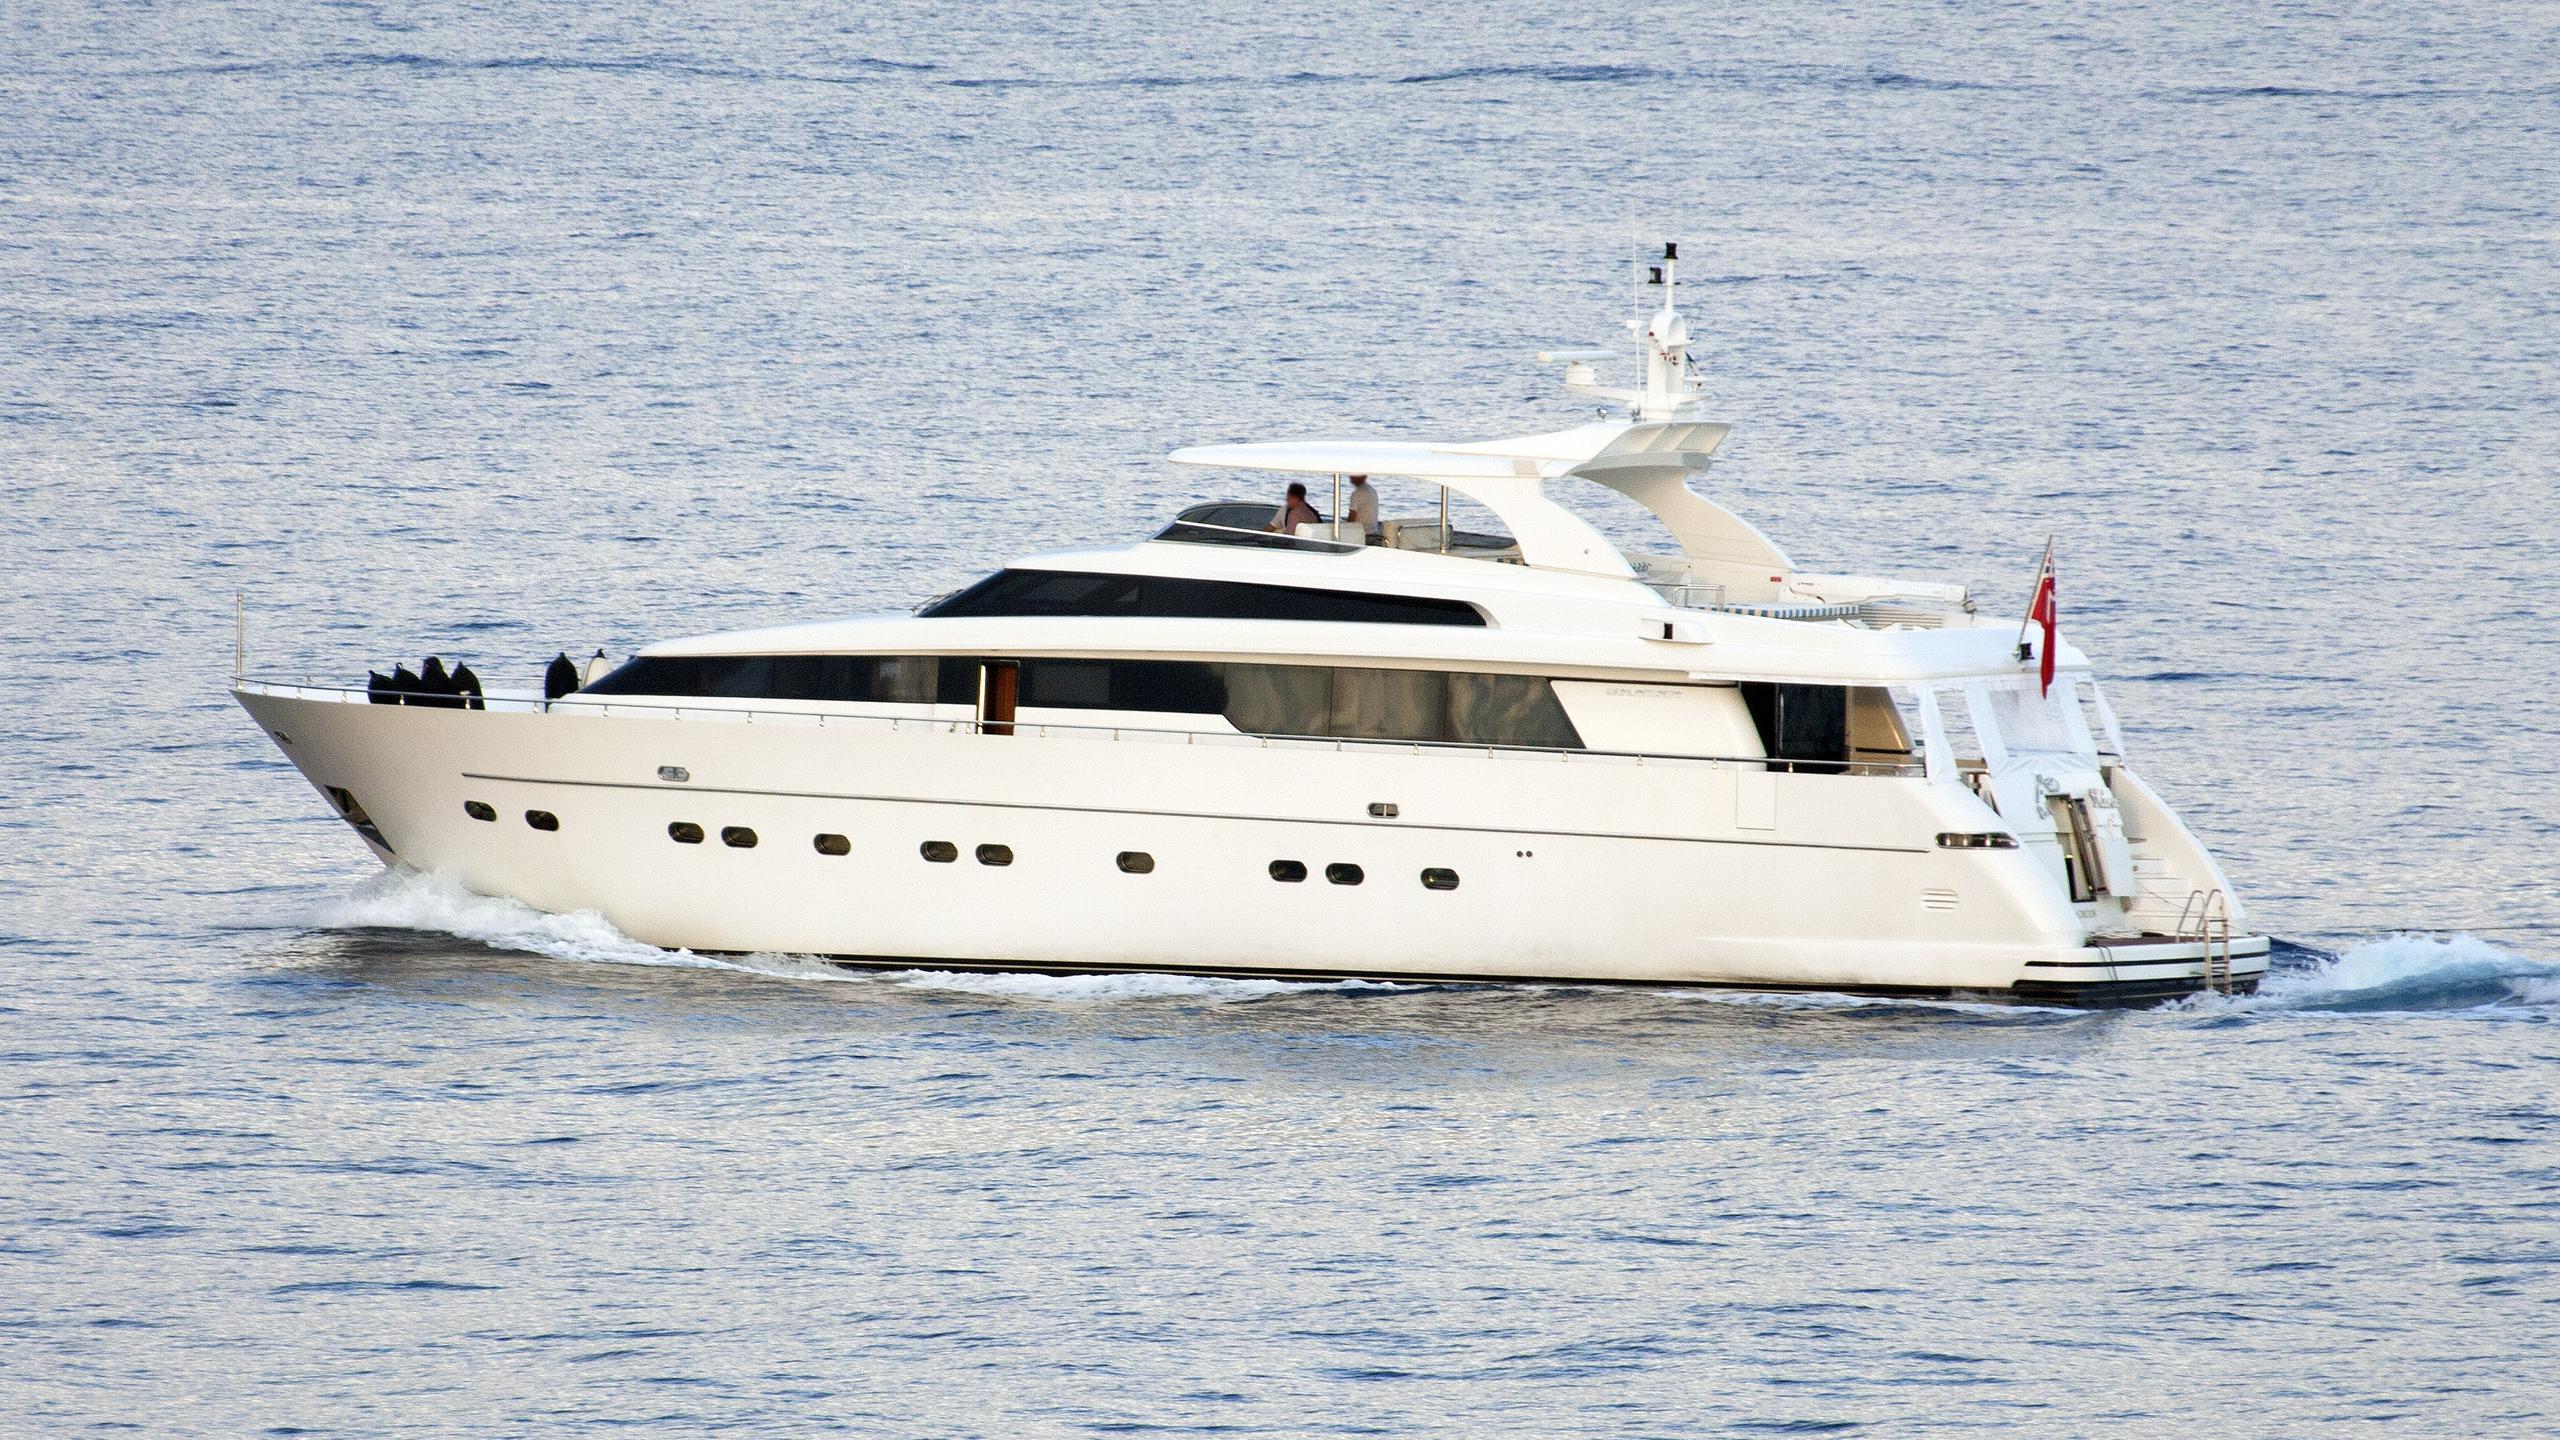 marcelina-of-london-motor-yacht-sanlorenzo-88-2007-27m-stern-half-profile